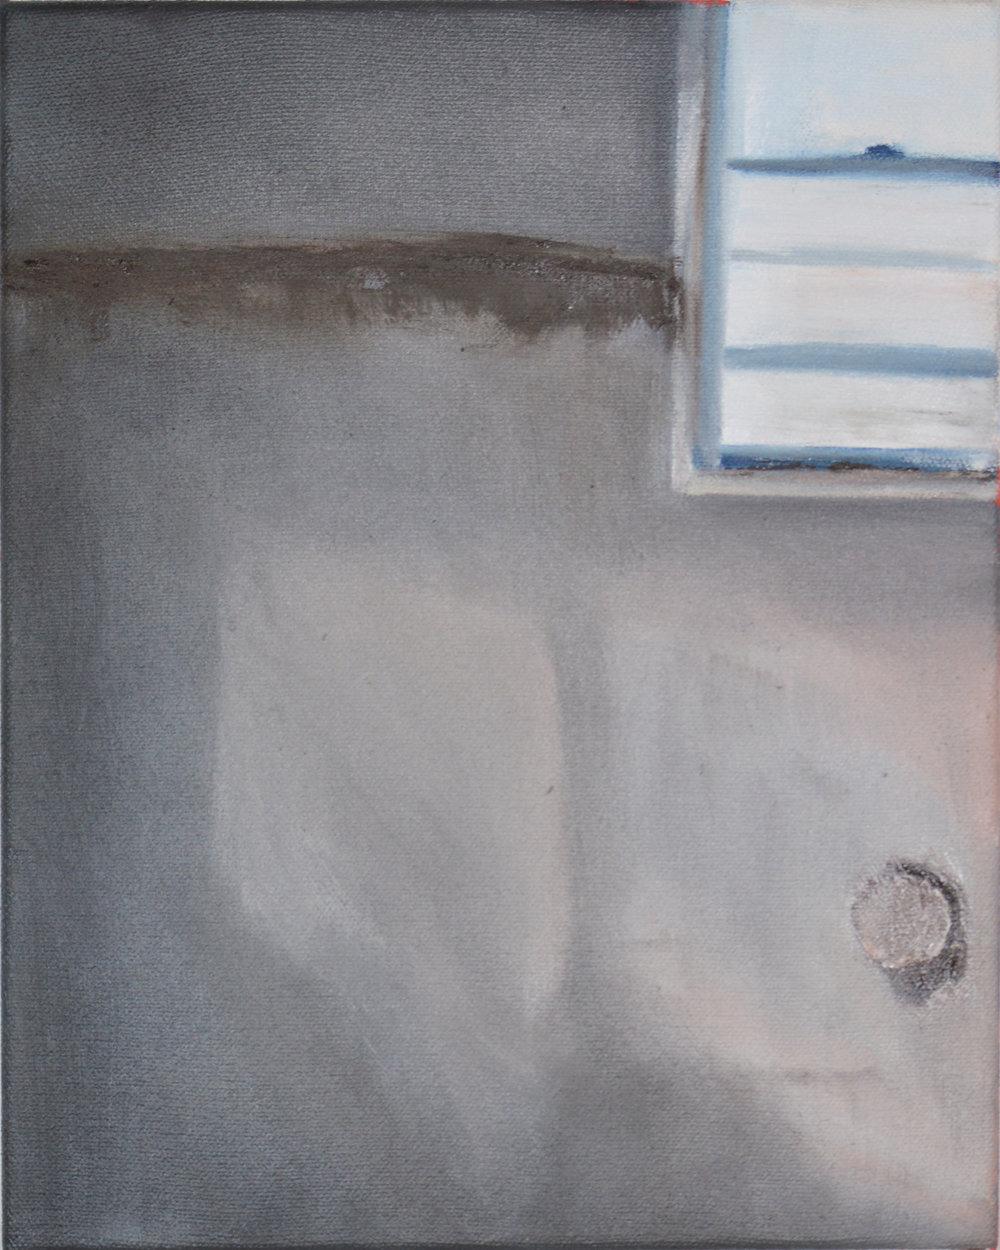 Gray Basement